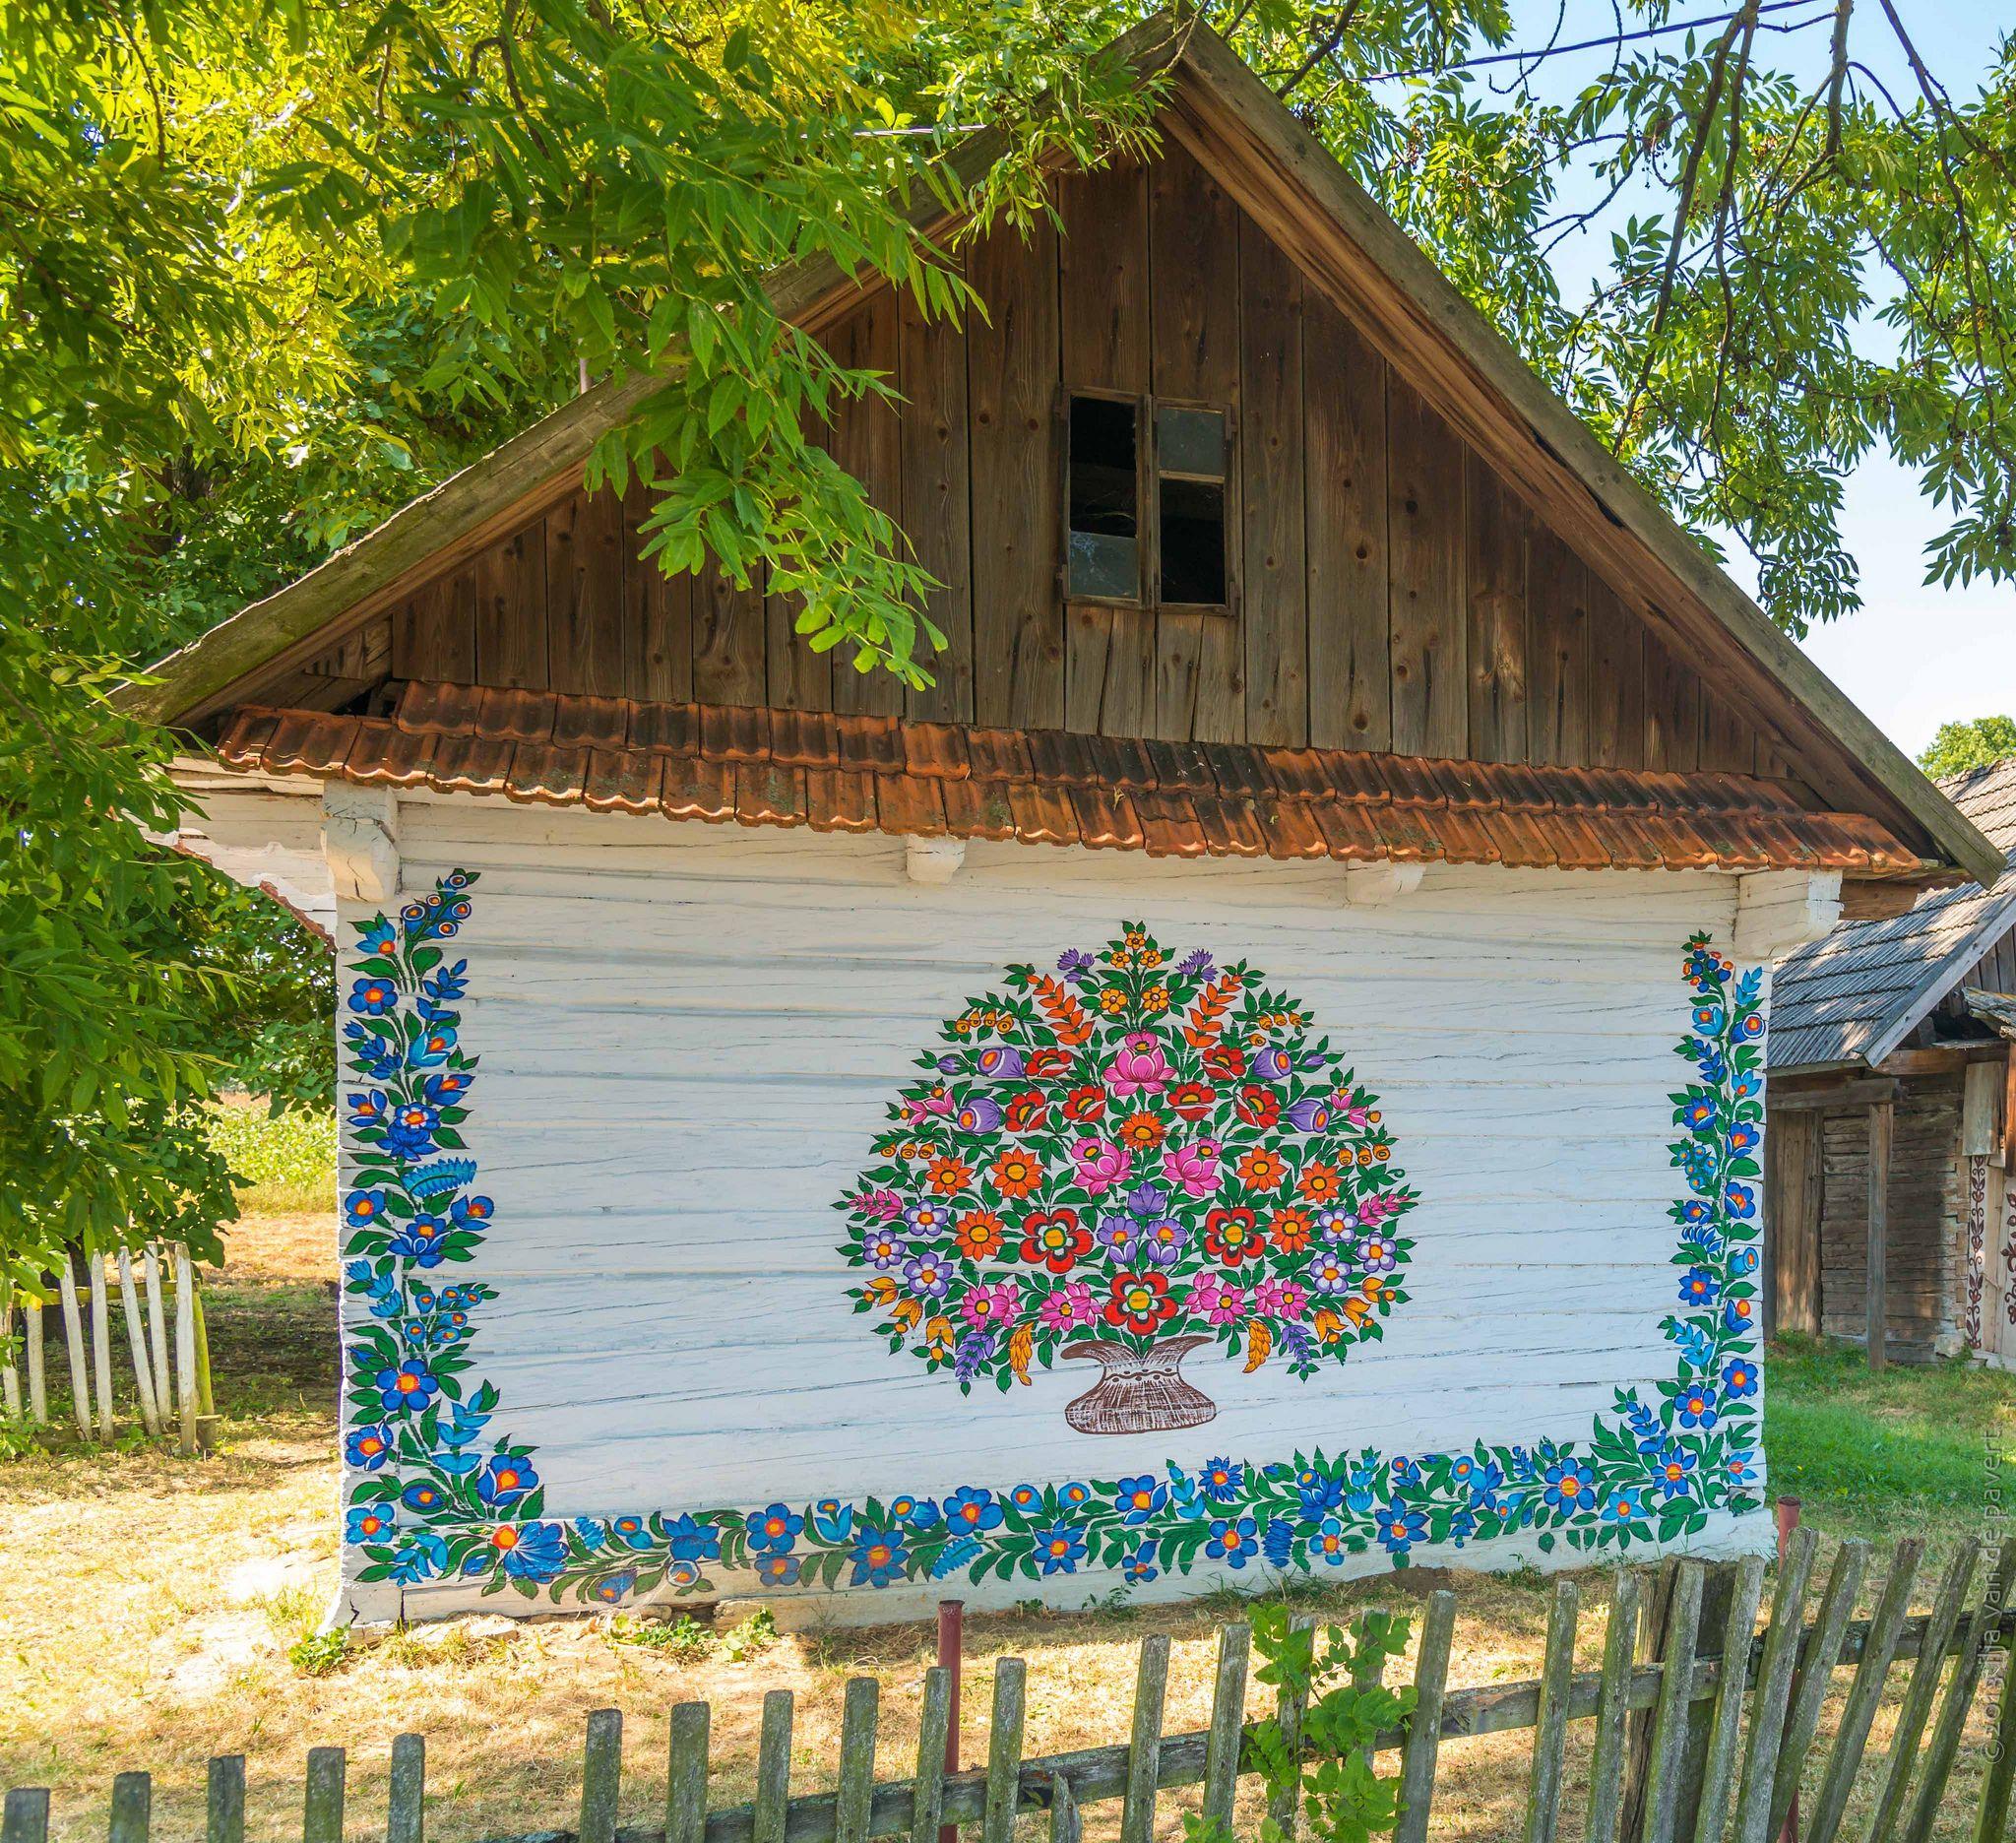 20130817 D8h3808 Polish Folk Art Village Flower Painting